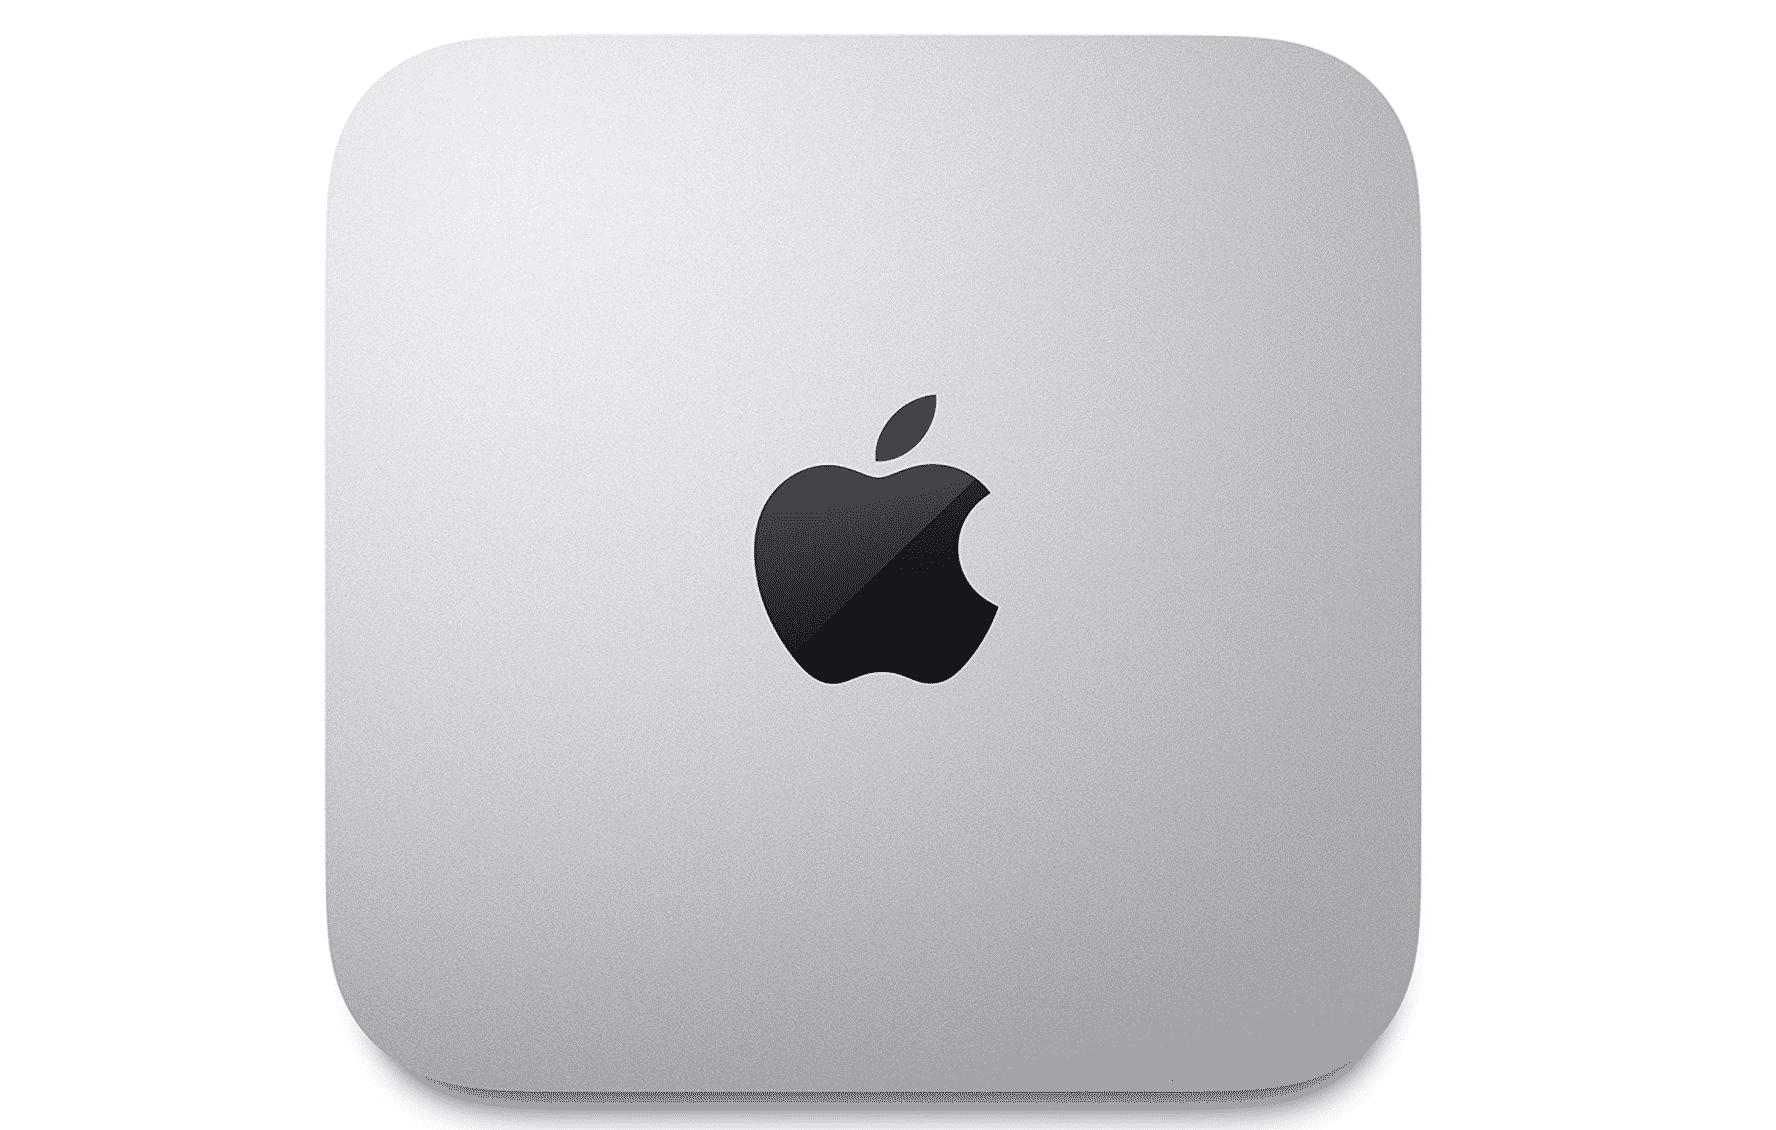 Apple Mac Mini with Apple M1 Chip